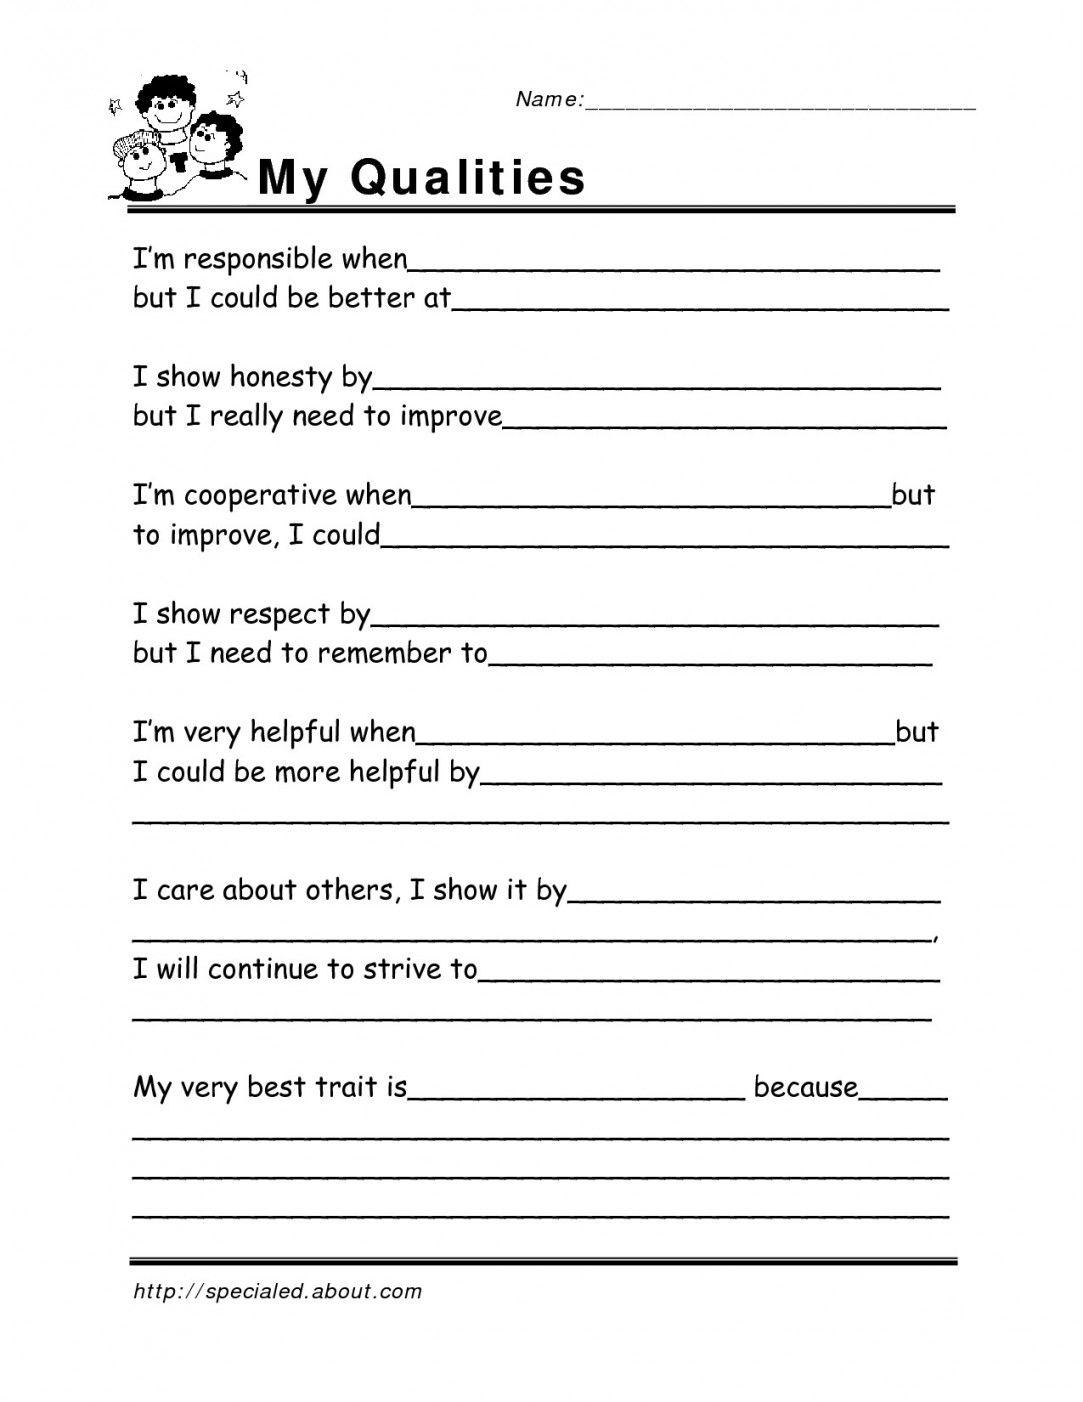 Free Printable Coping Skills Worksheets   Lostranquillos - Free Printable Coping Skills Worksheets For Adults